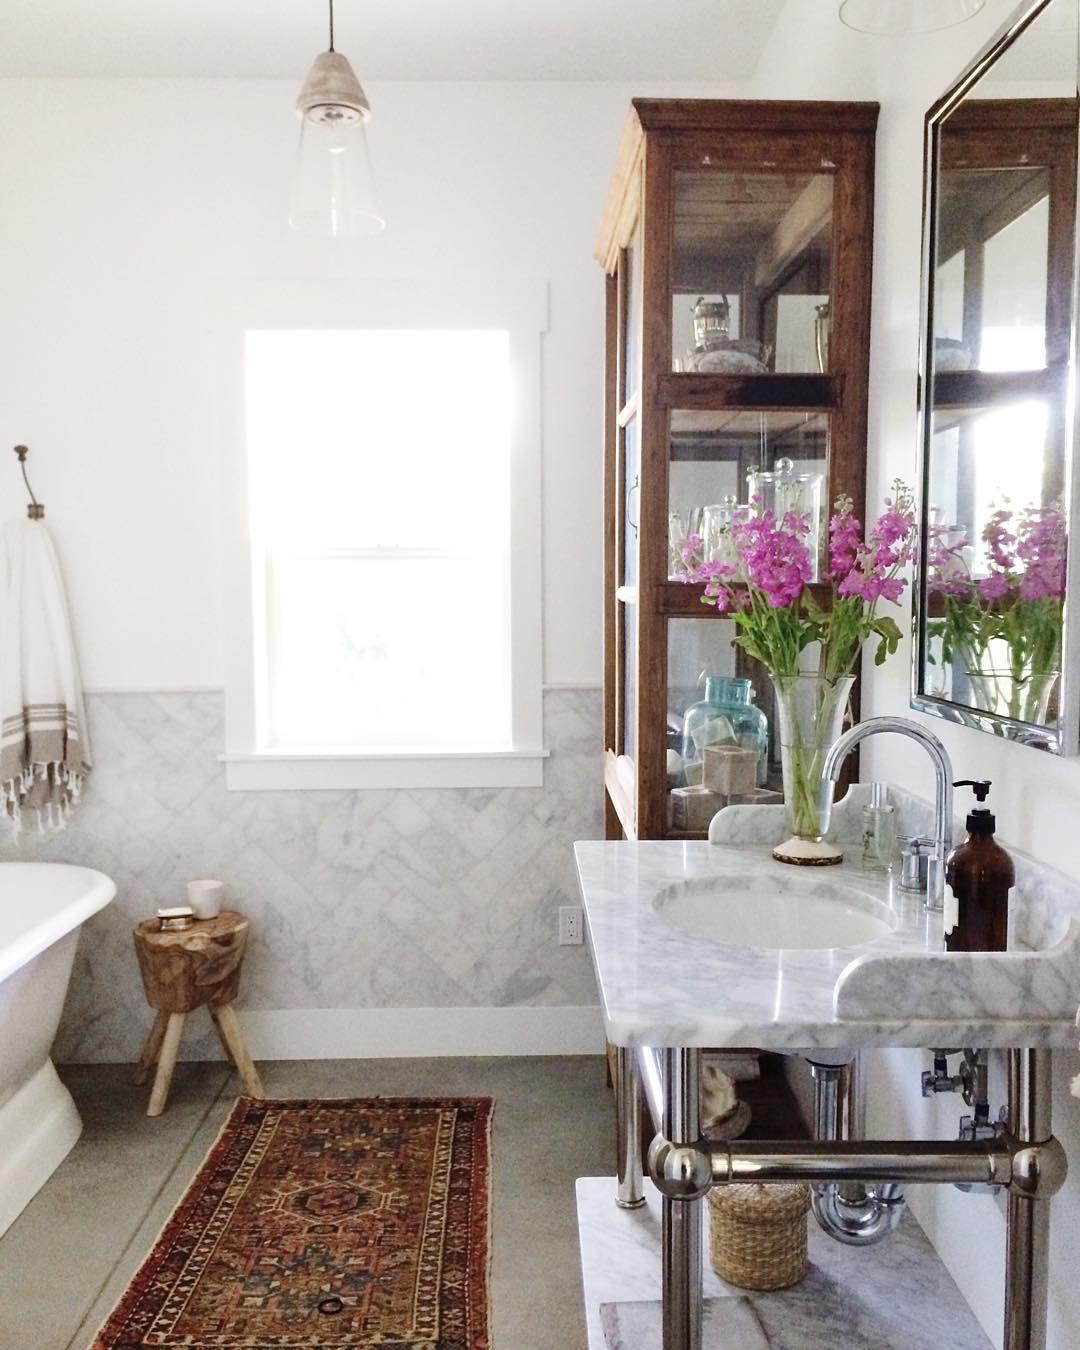 vintage bathroom inspiration | British colonial decor | Pinterest ...